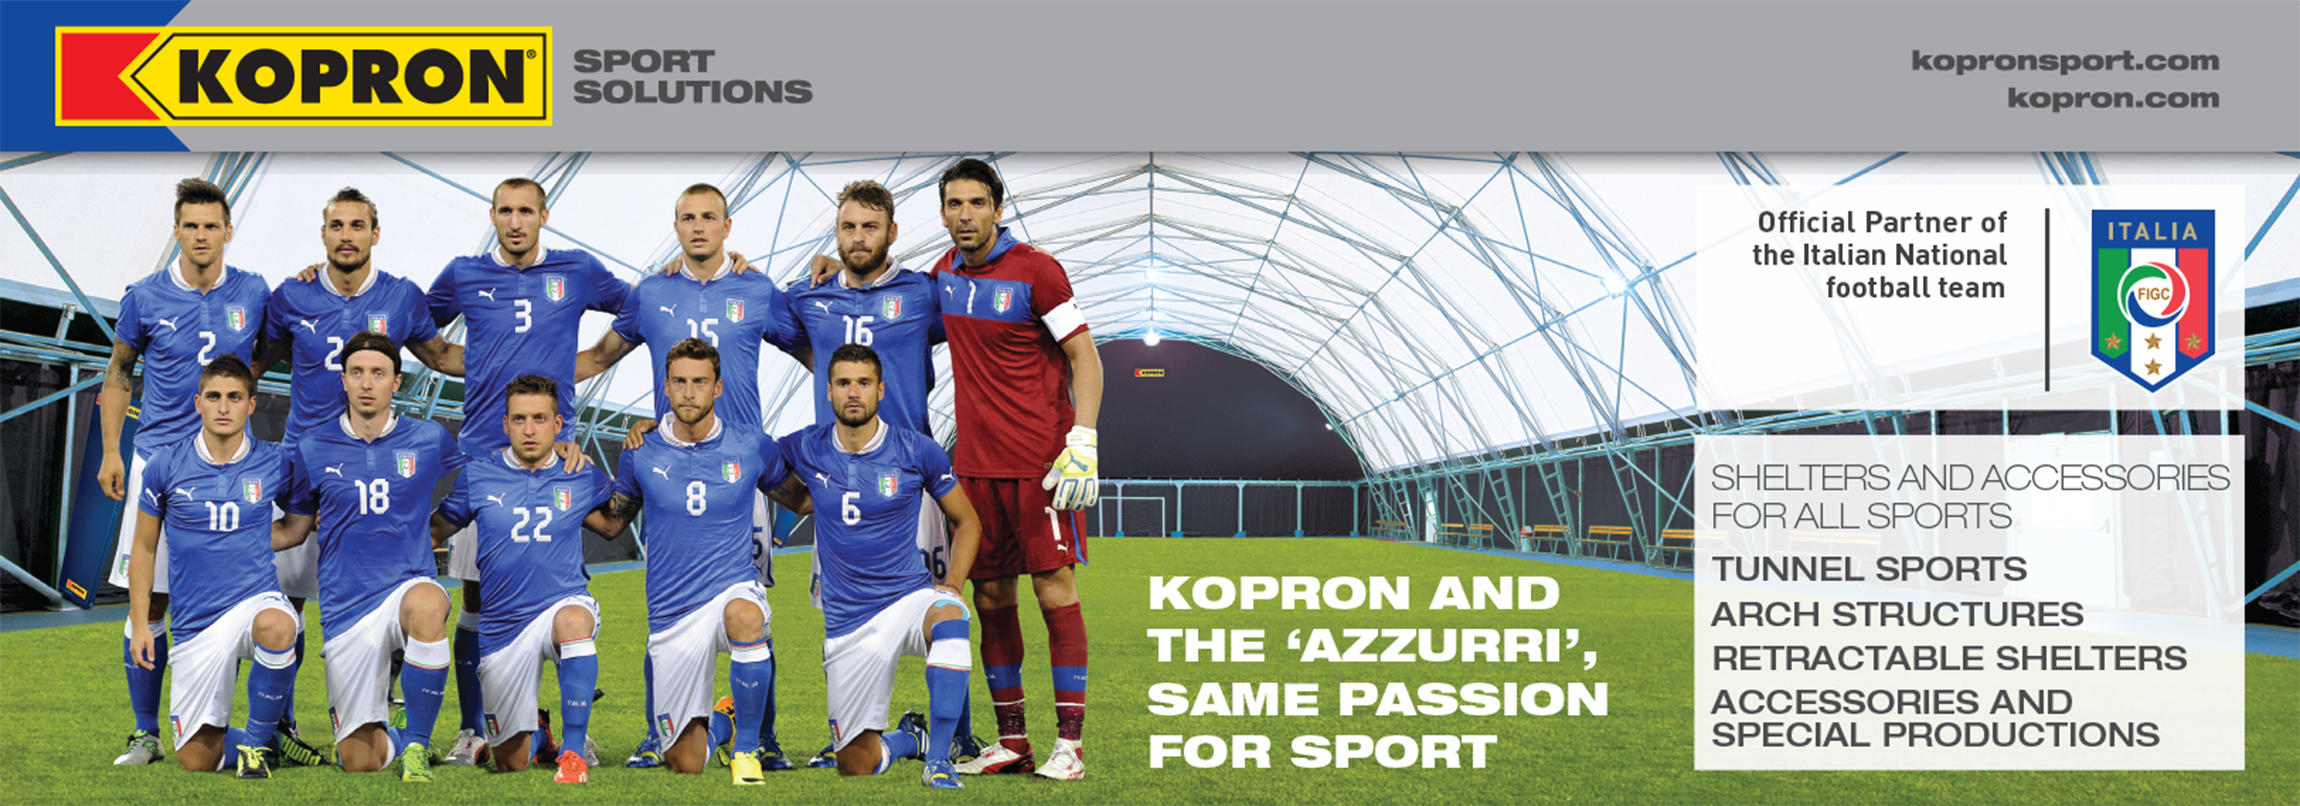 Kopron-partner-italienischen-Fussball-Nationalmannschaft